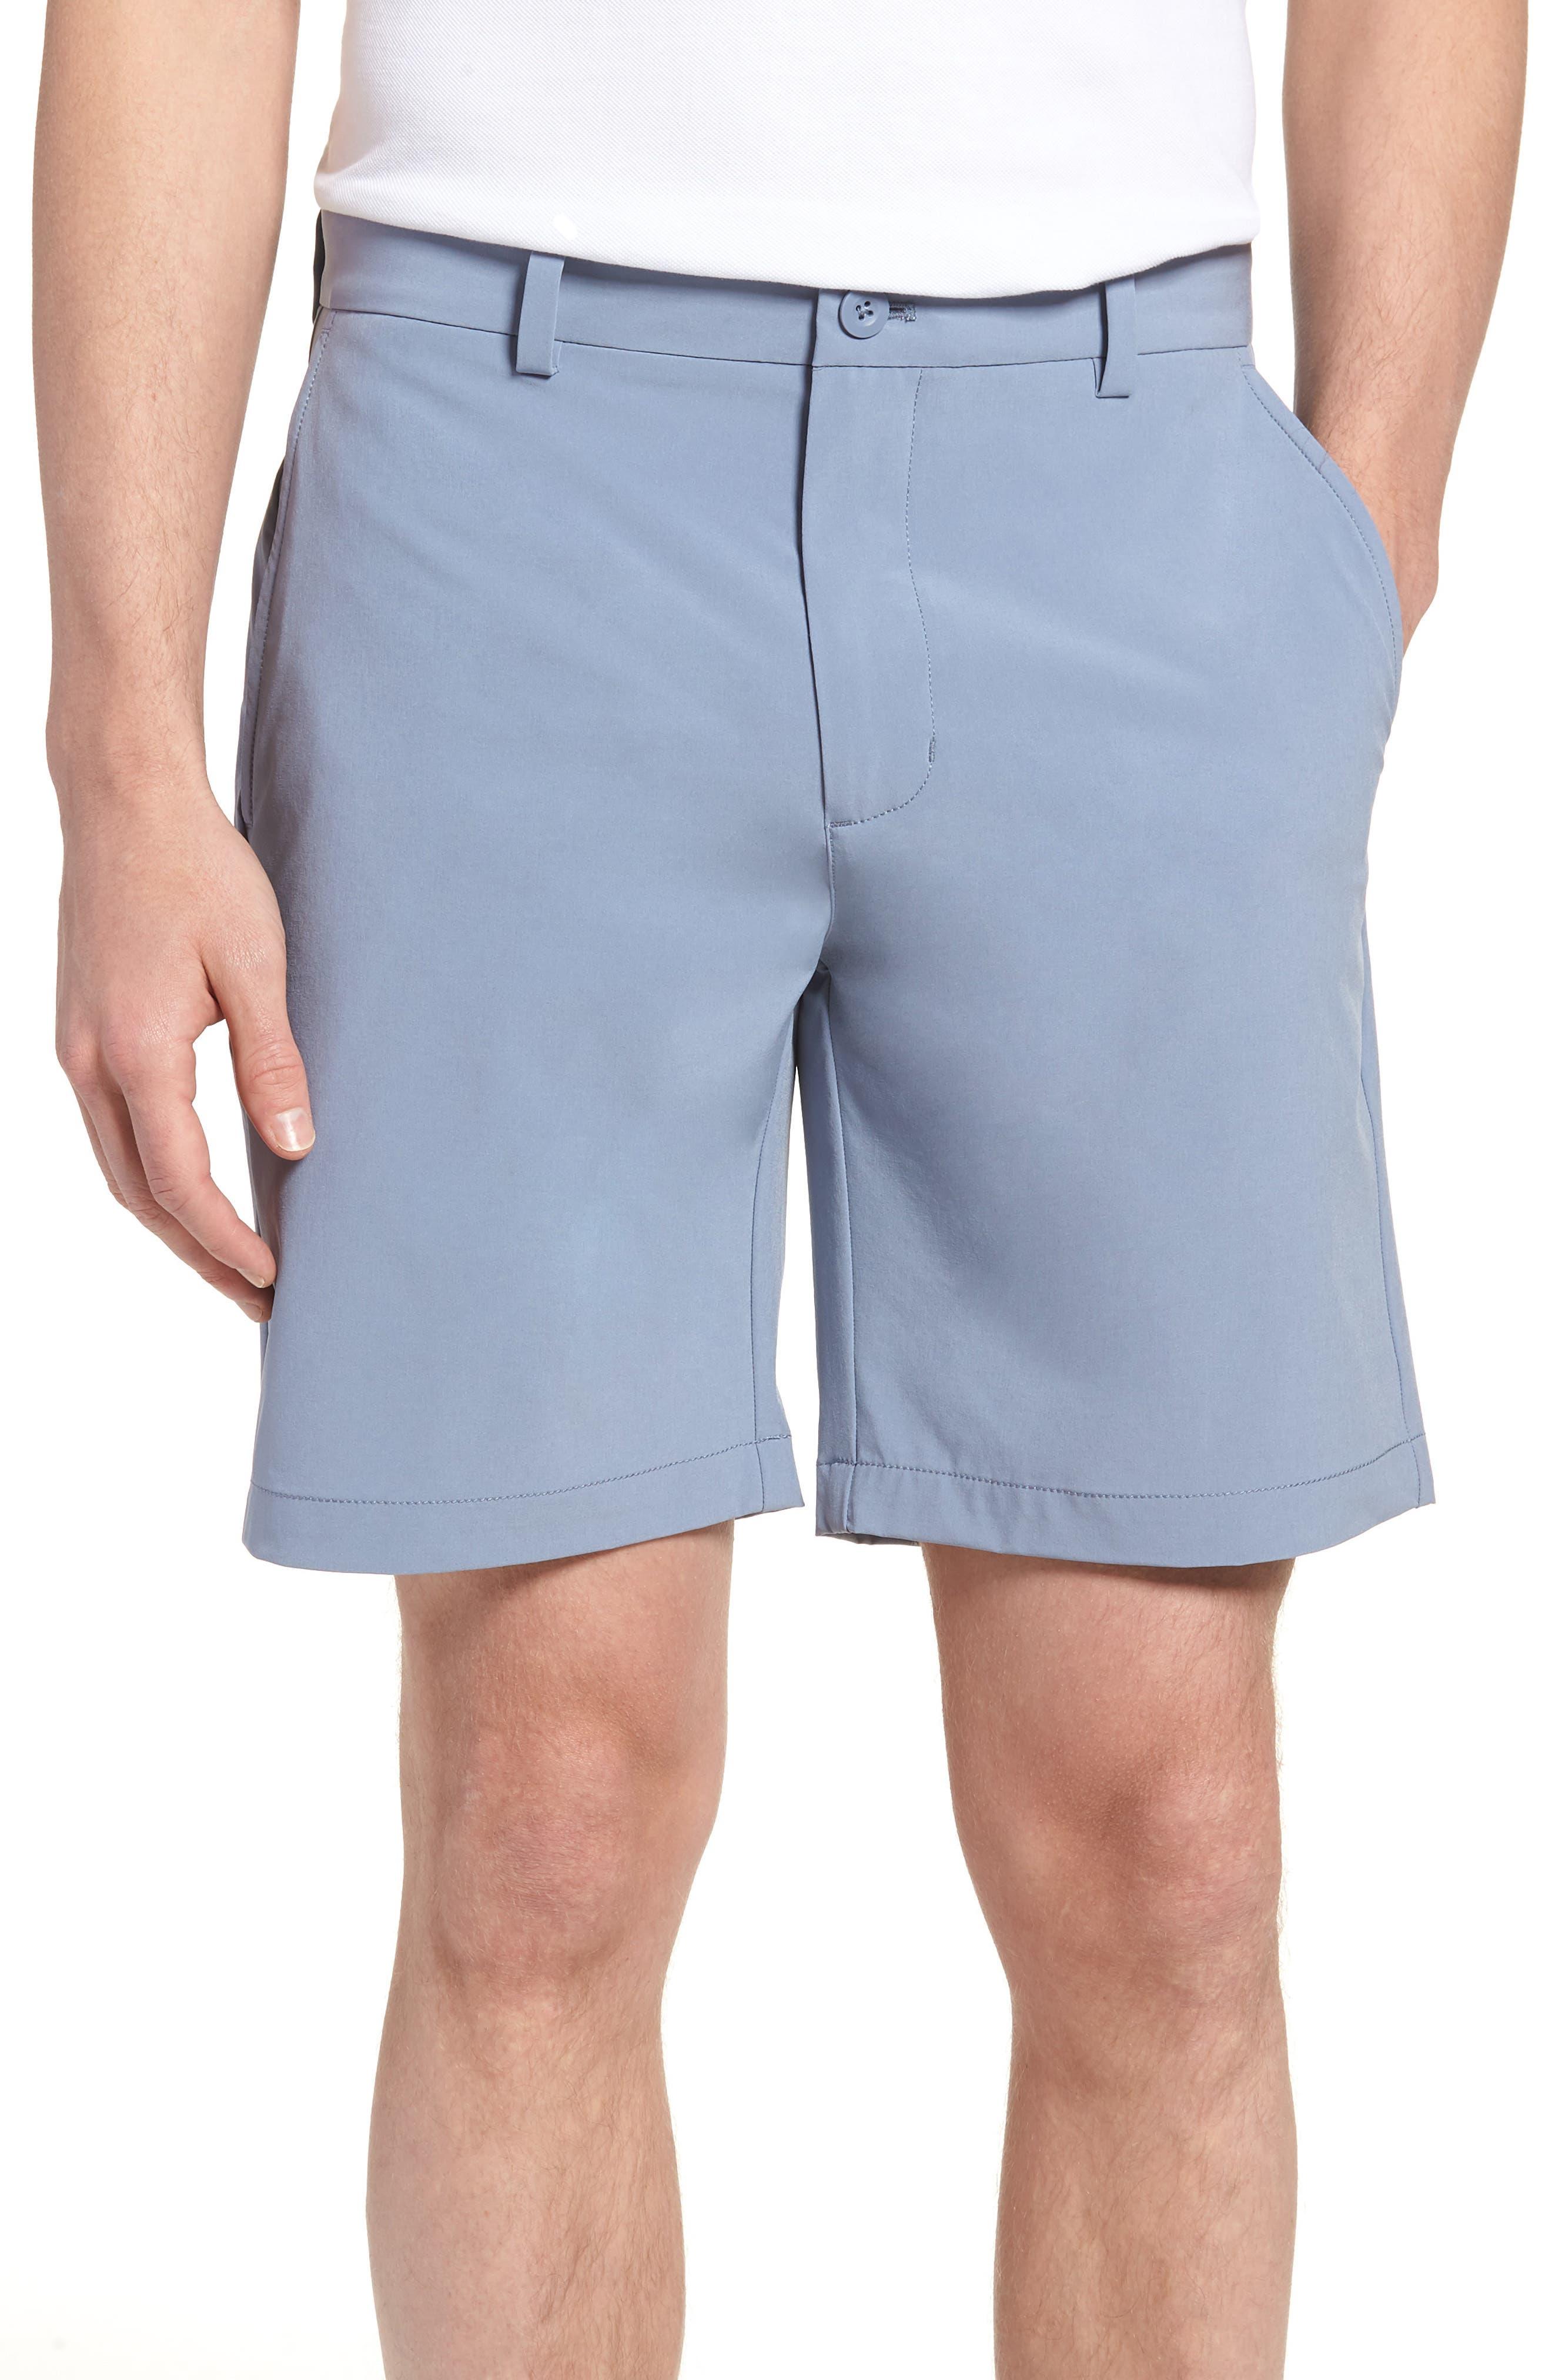 8 Inch Performance Breaker Shorts,                         Main,                         color, Shark